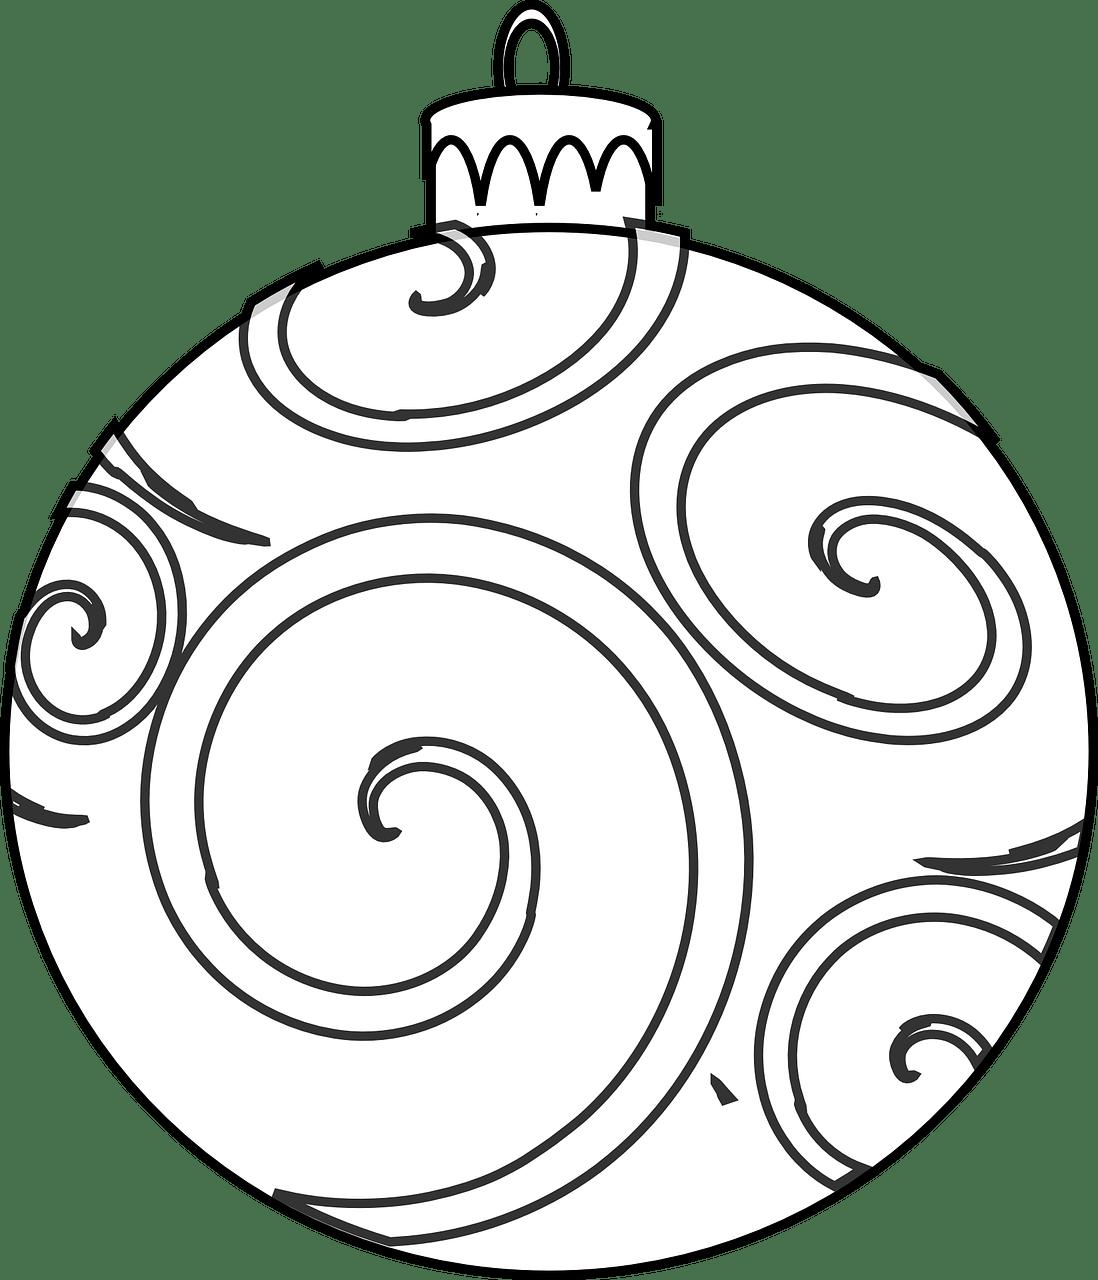 Colour and design your. Ornaments clipart printer